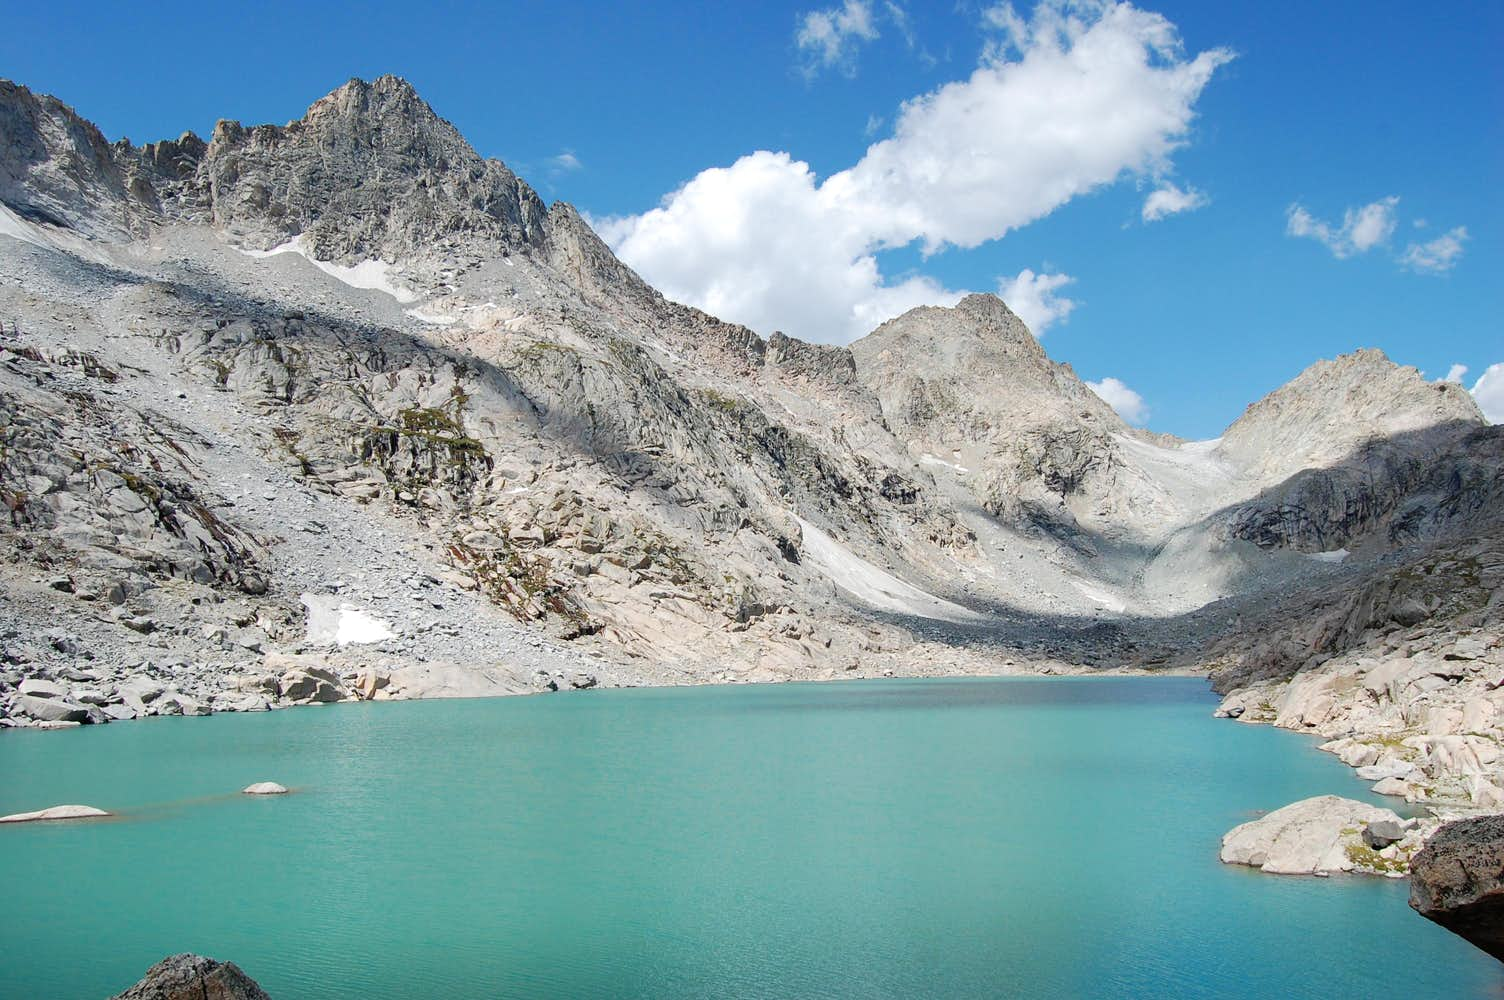 Summer Ice Lake, Wyoming : Photos, Diagrams & Topos : SummitPost